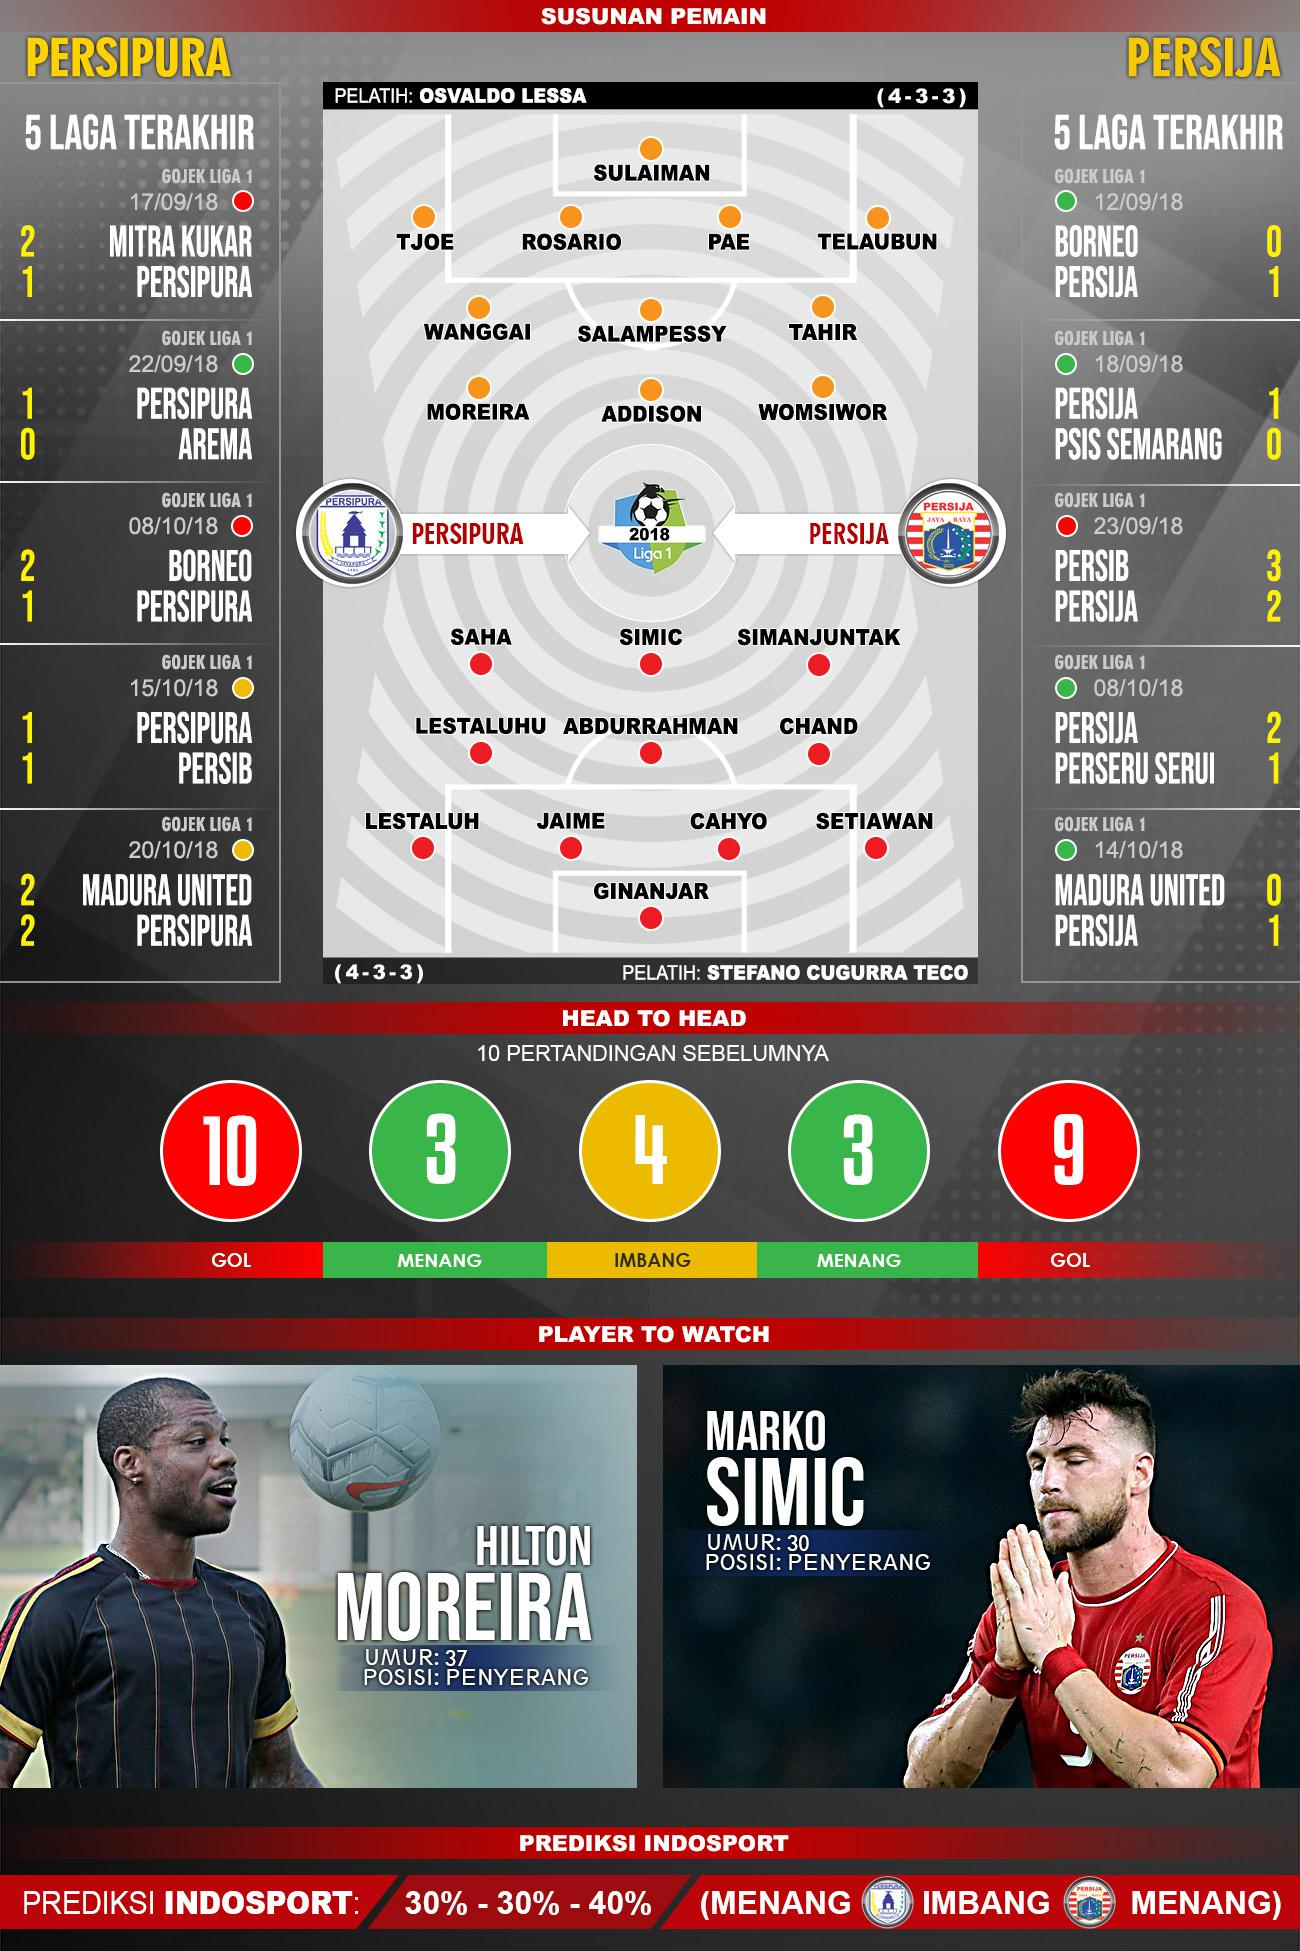 Pertandingan Persipura Jayapura vs Persija Jakarta. Copyright: Indosport.com